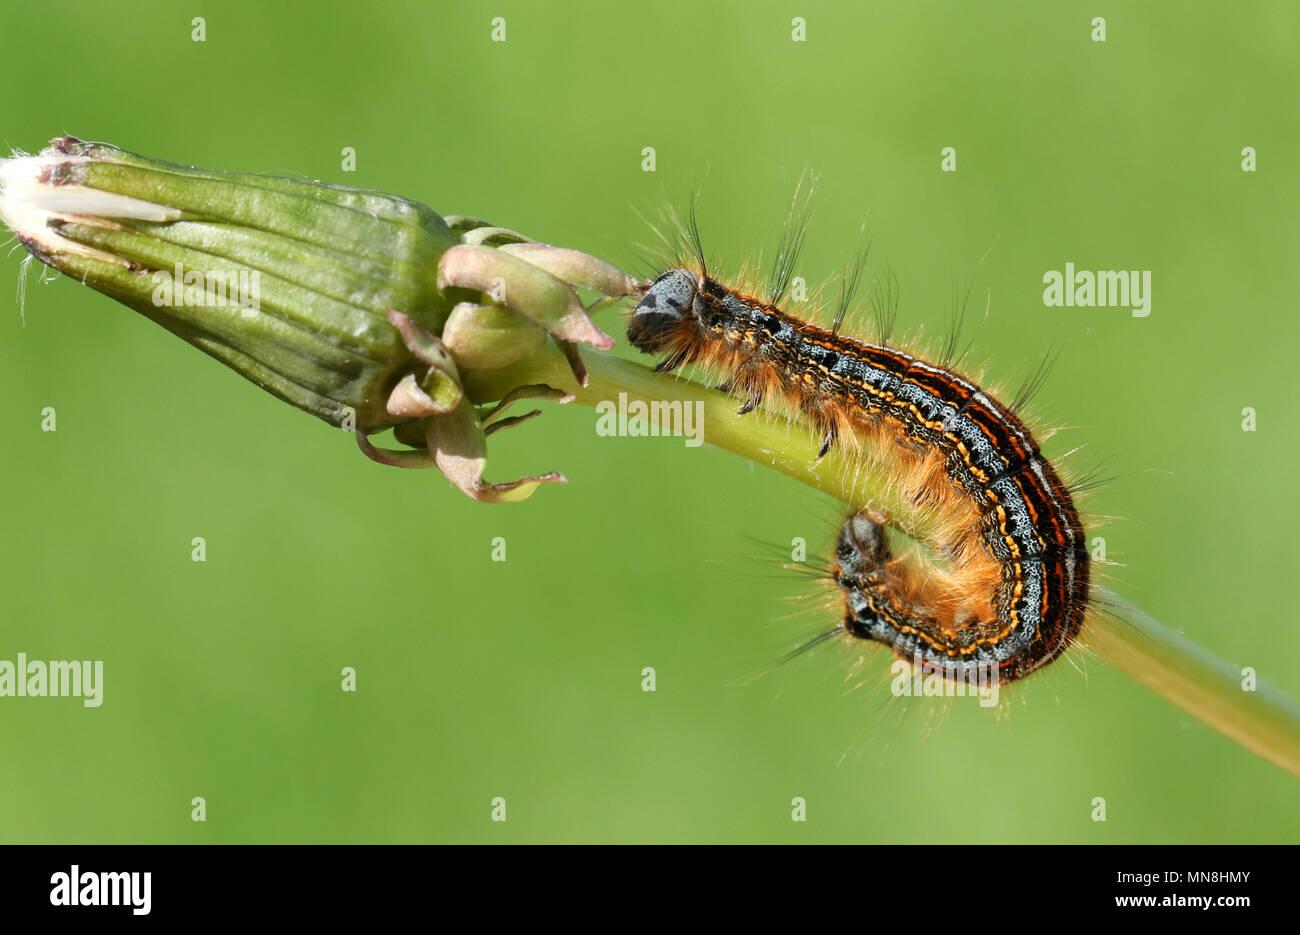 A stunning Lackey Moth Caterpillar  (Malacosoma neustria) on a dandelion stem. - Stock Image